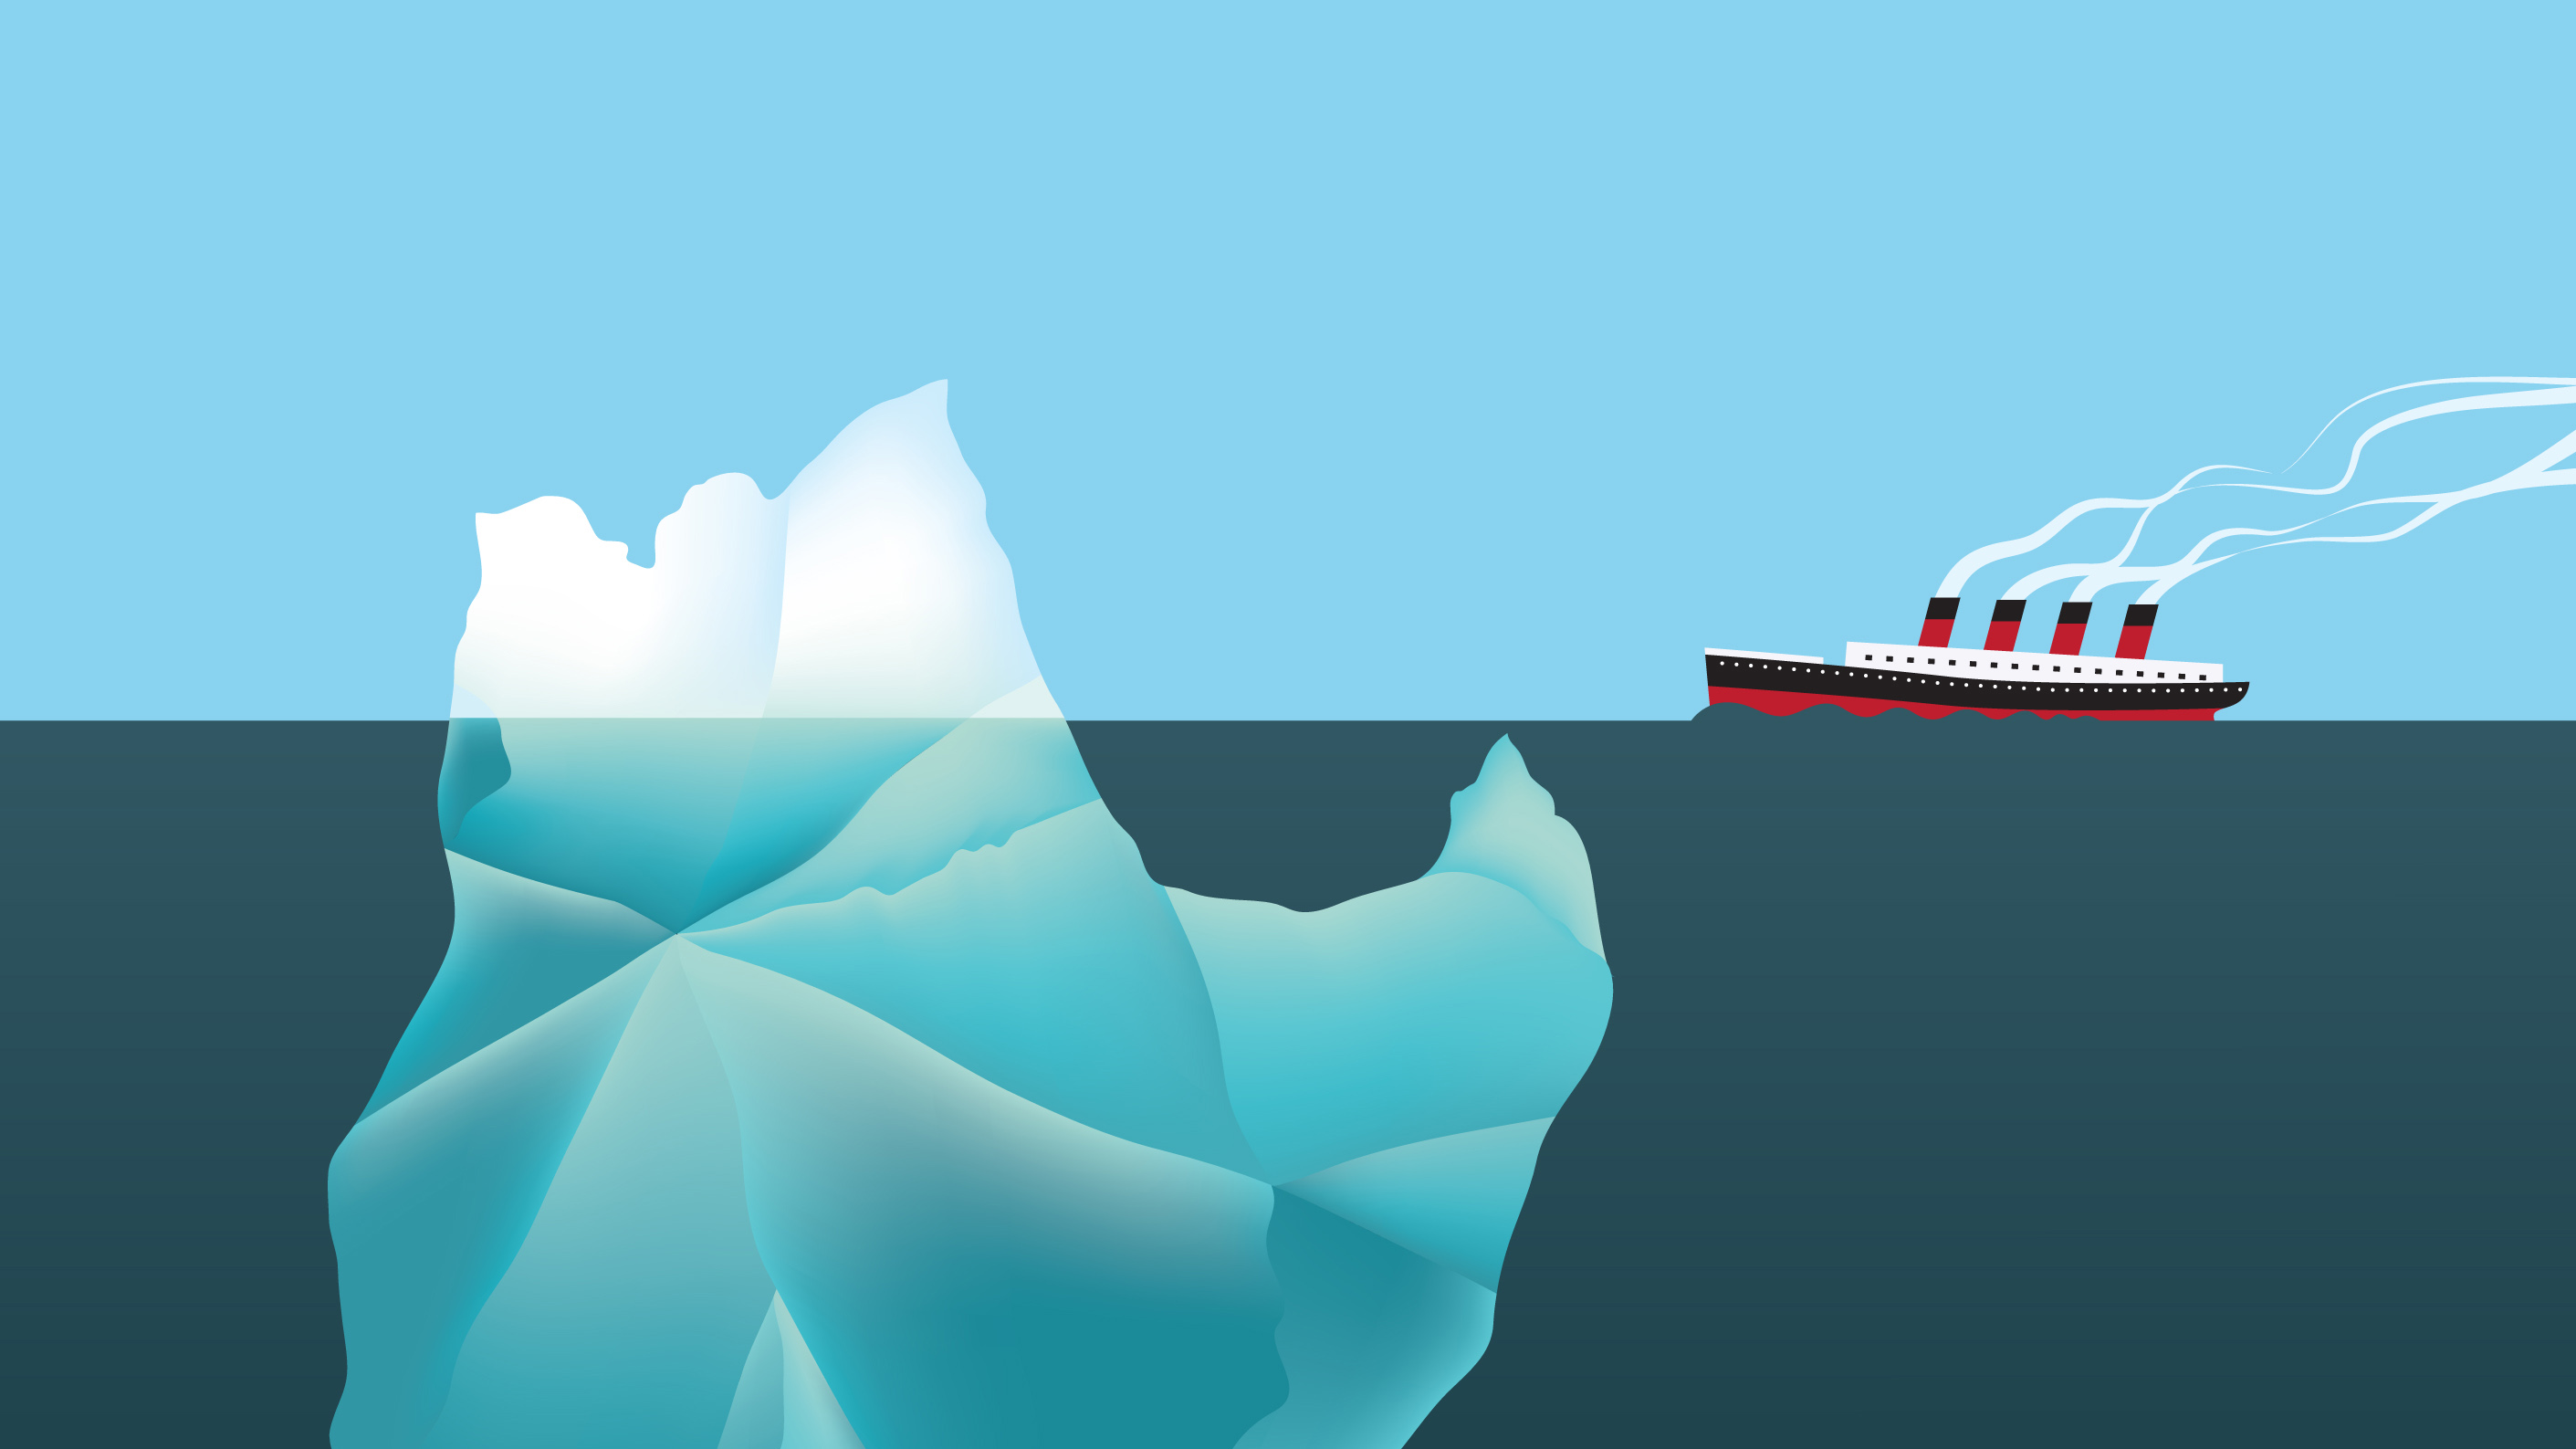 extra extra titanic sinks scholastic titanic sinks scholastic